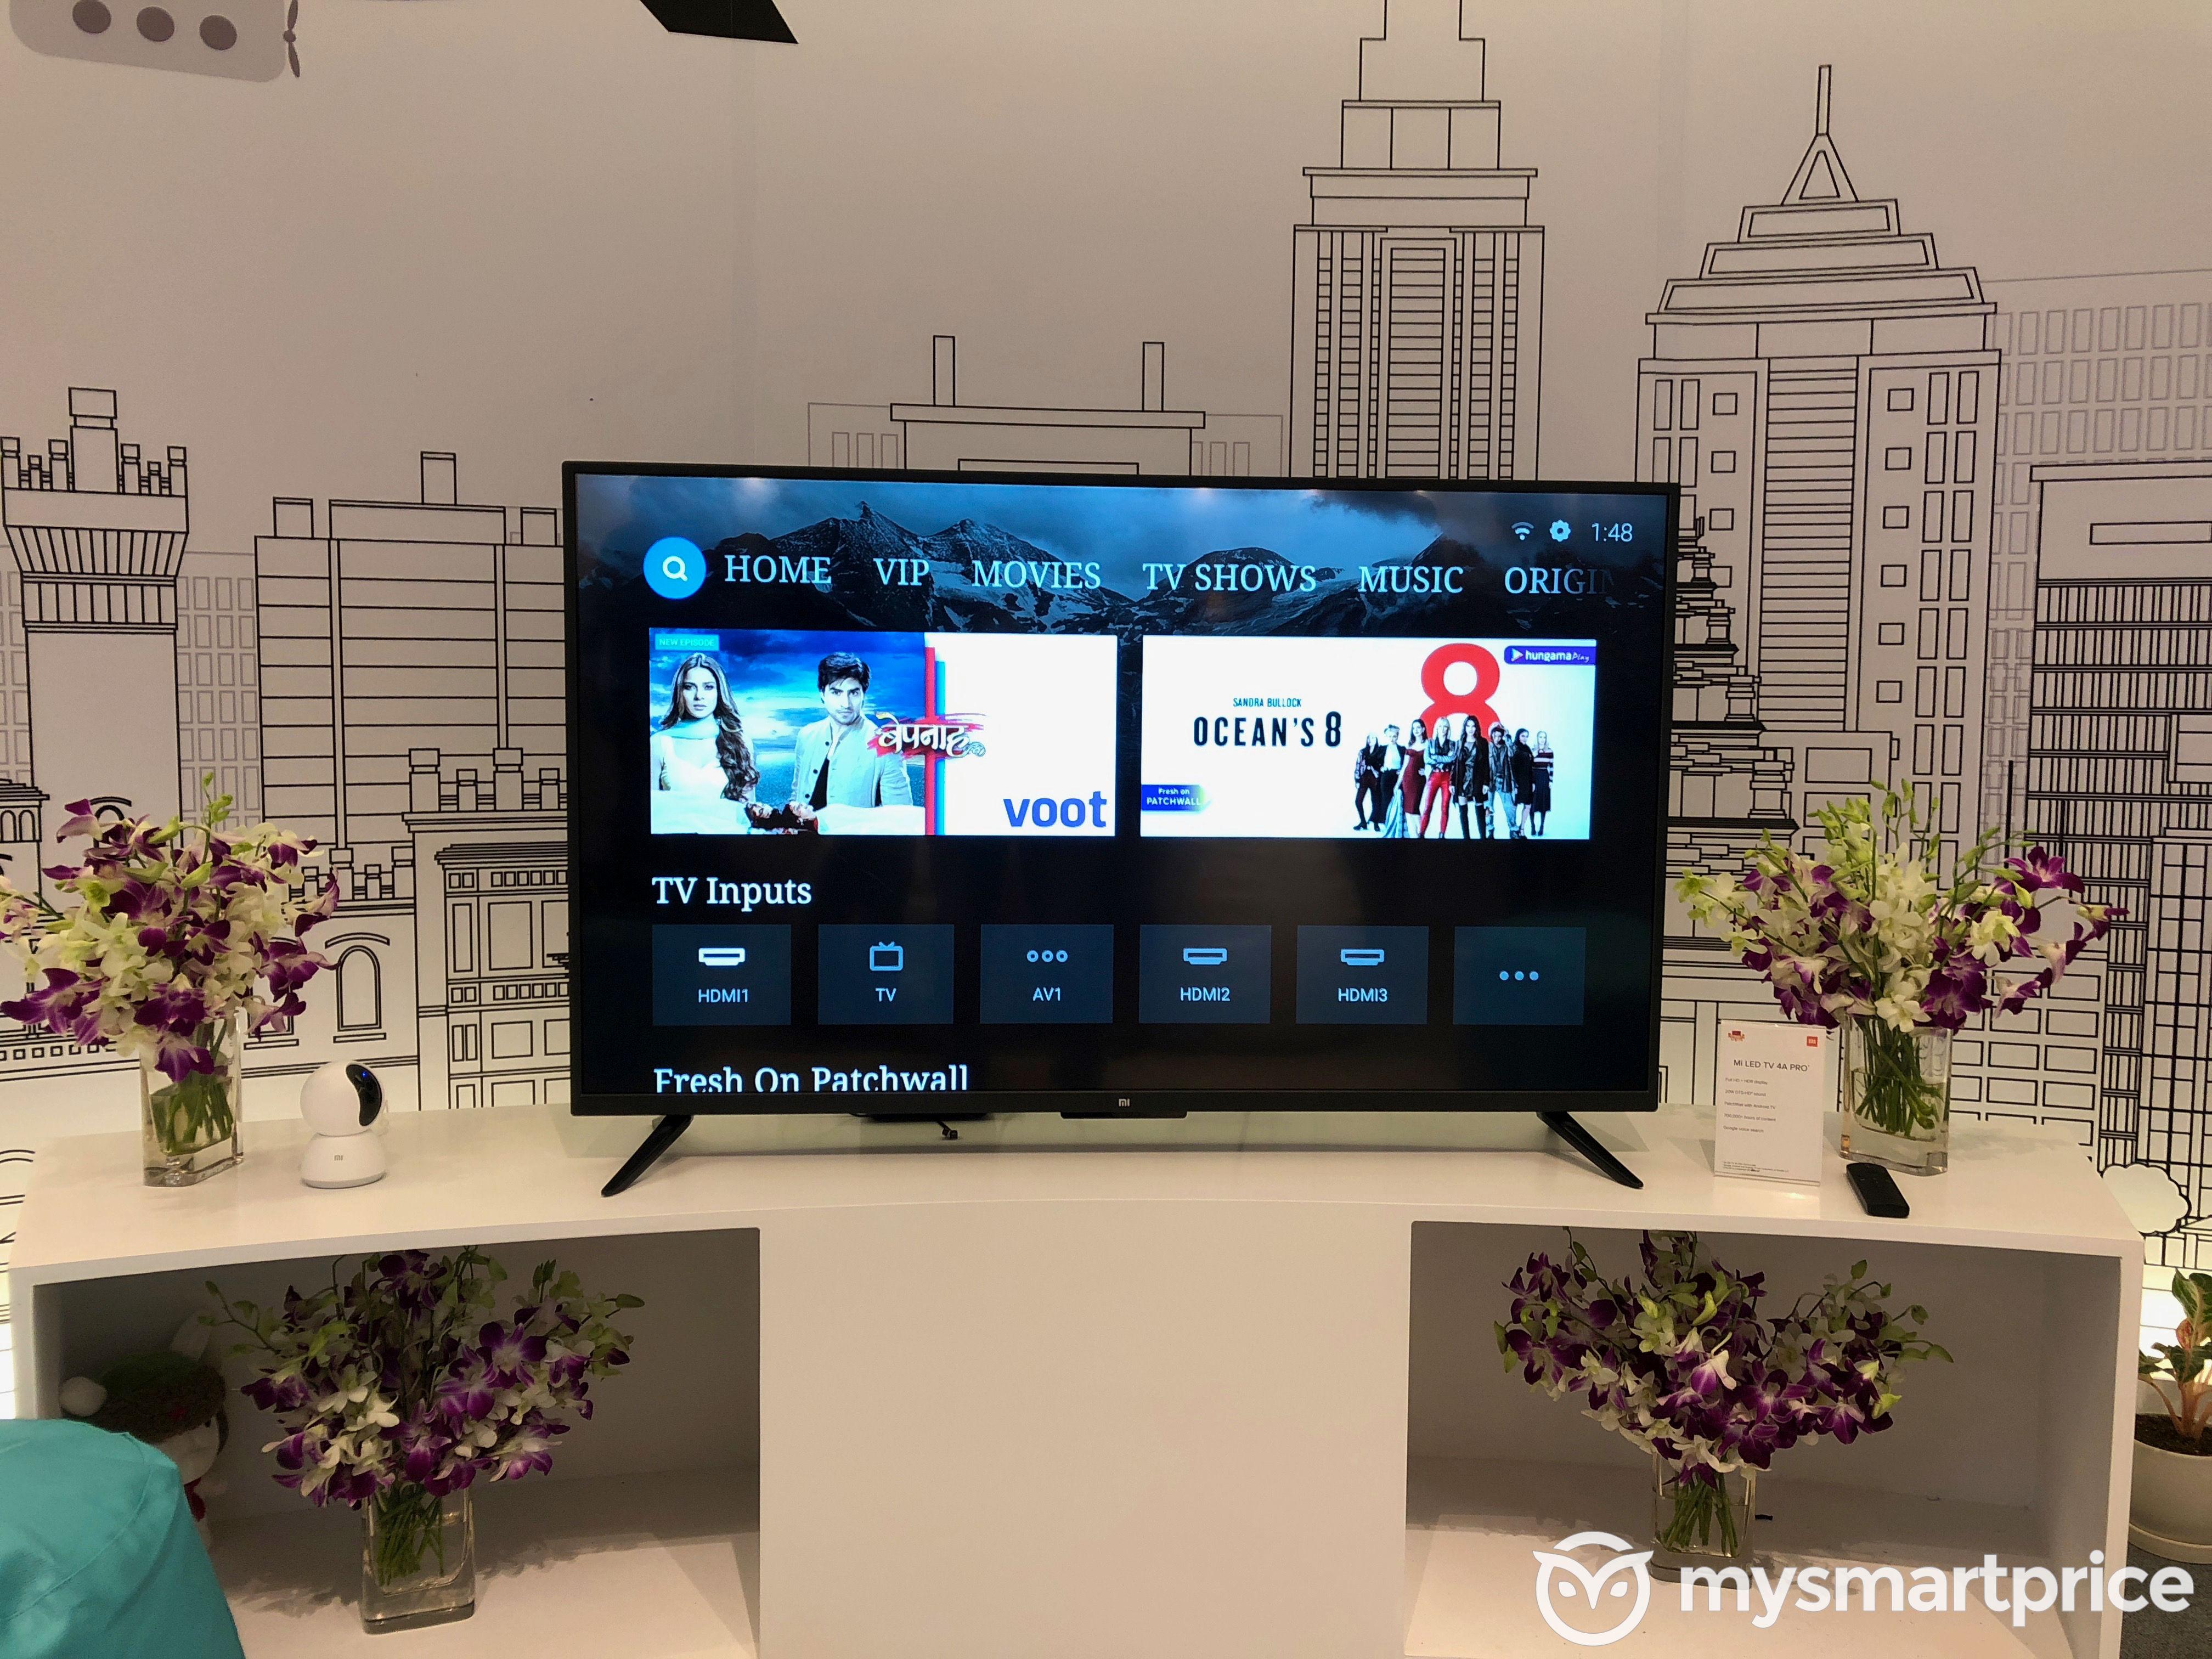 Mi TV 4 Pro 55-inch, Mi TV 4A Pro 49-inch, Mi TV 4C Pro 32-inch